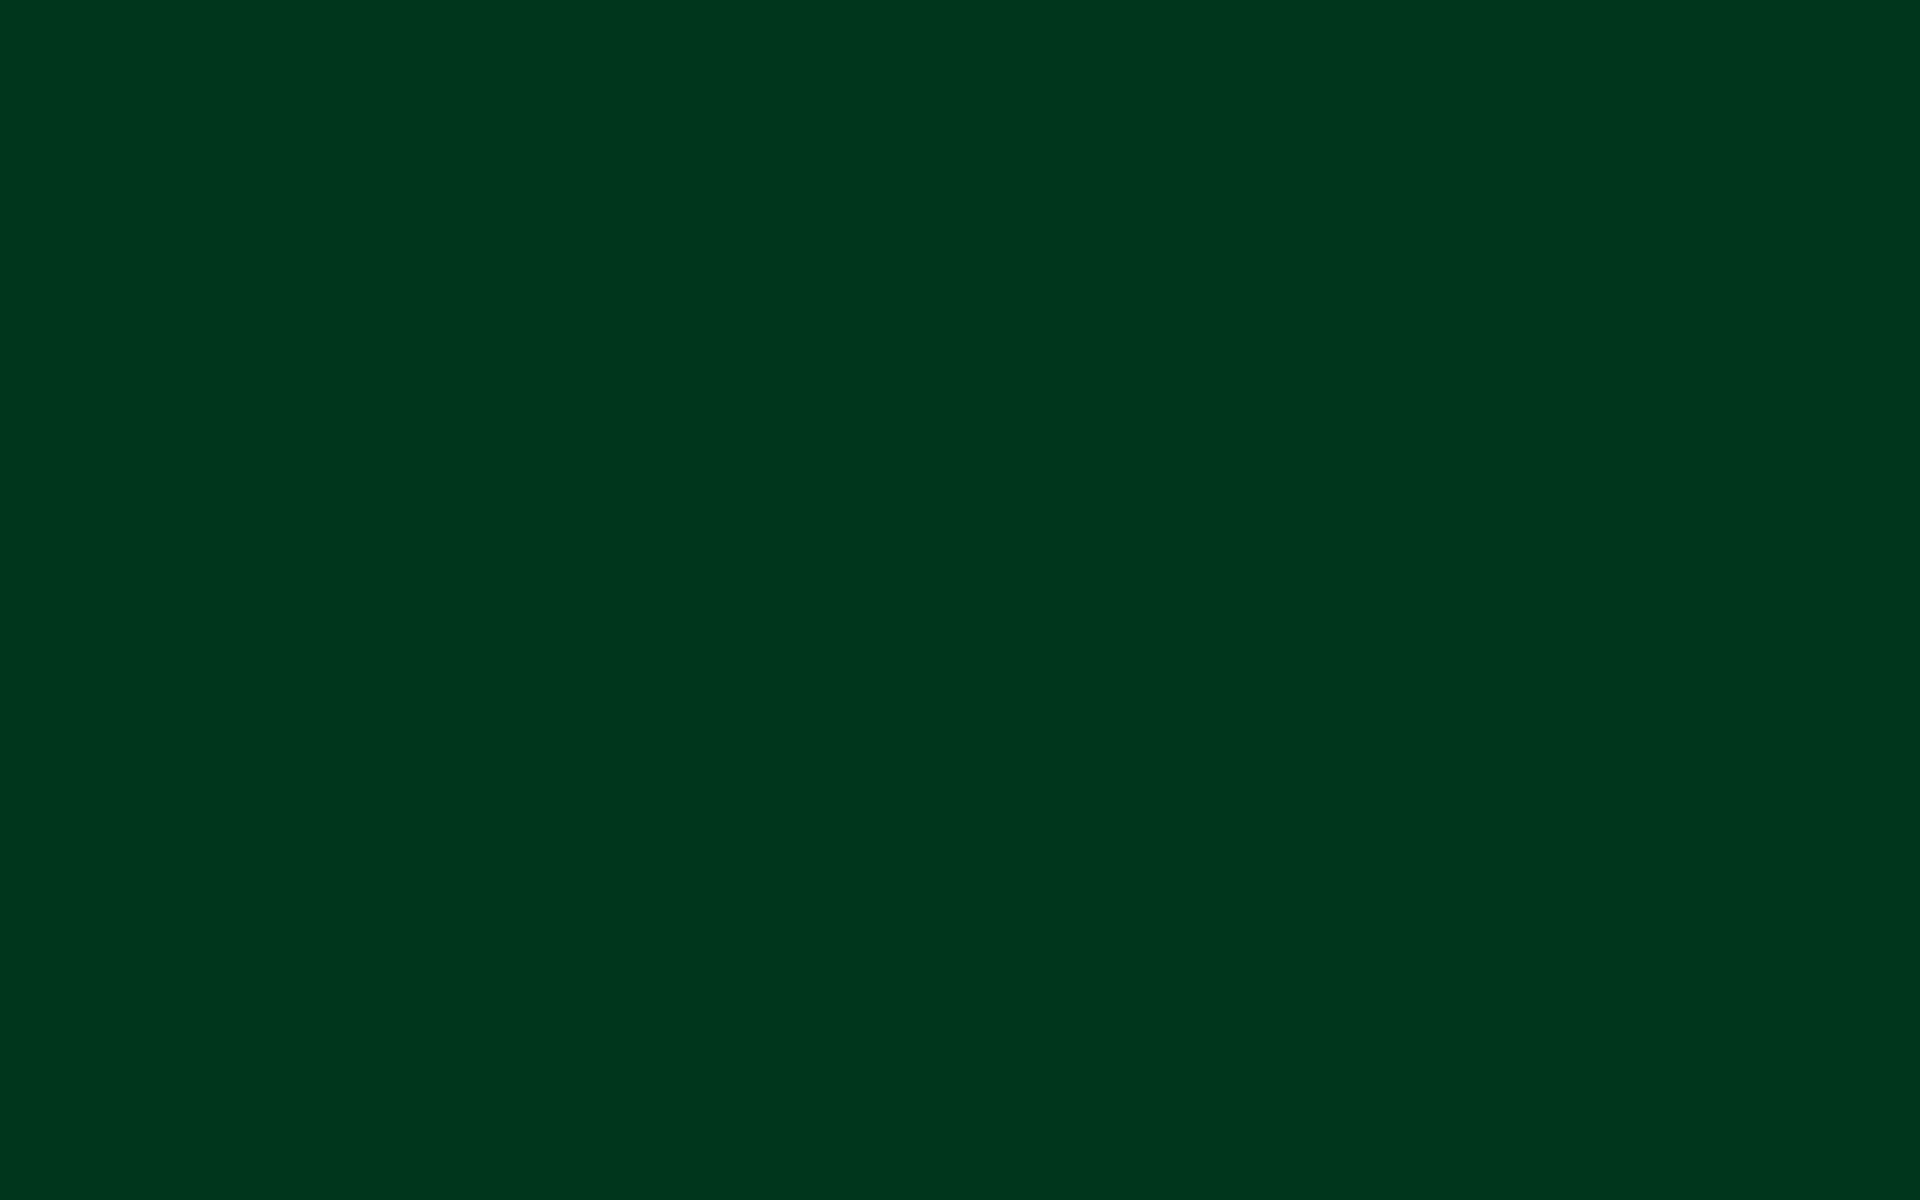 Steve o'sullivan - Green trax